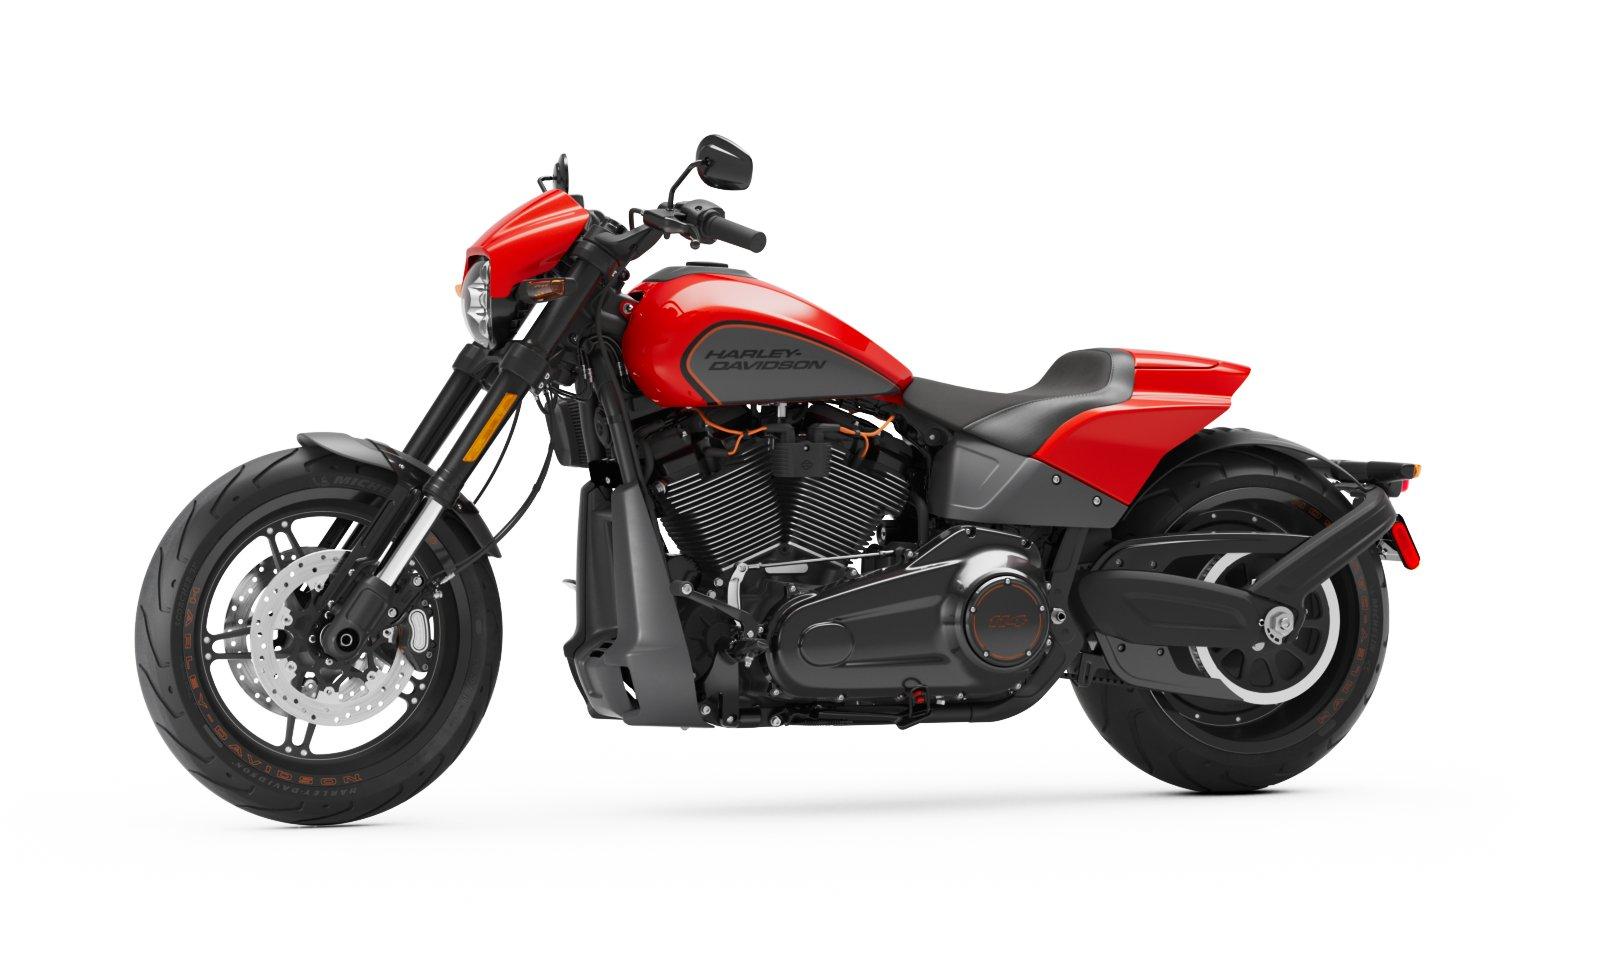 114 2020 fxdr 114 motorcycle harley davidson united states 1142 latigo cv 91915 2020 fxdr 114 motorcycle harley